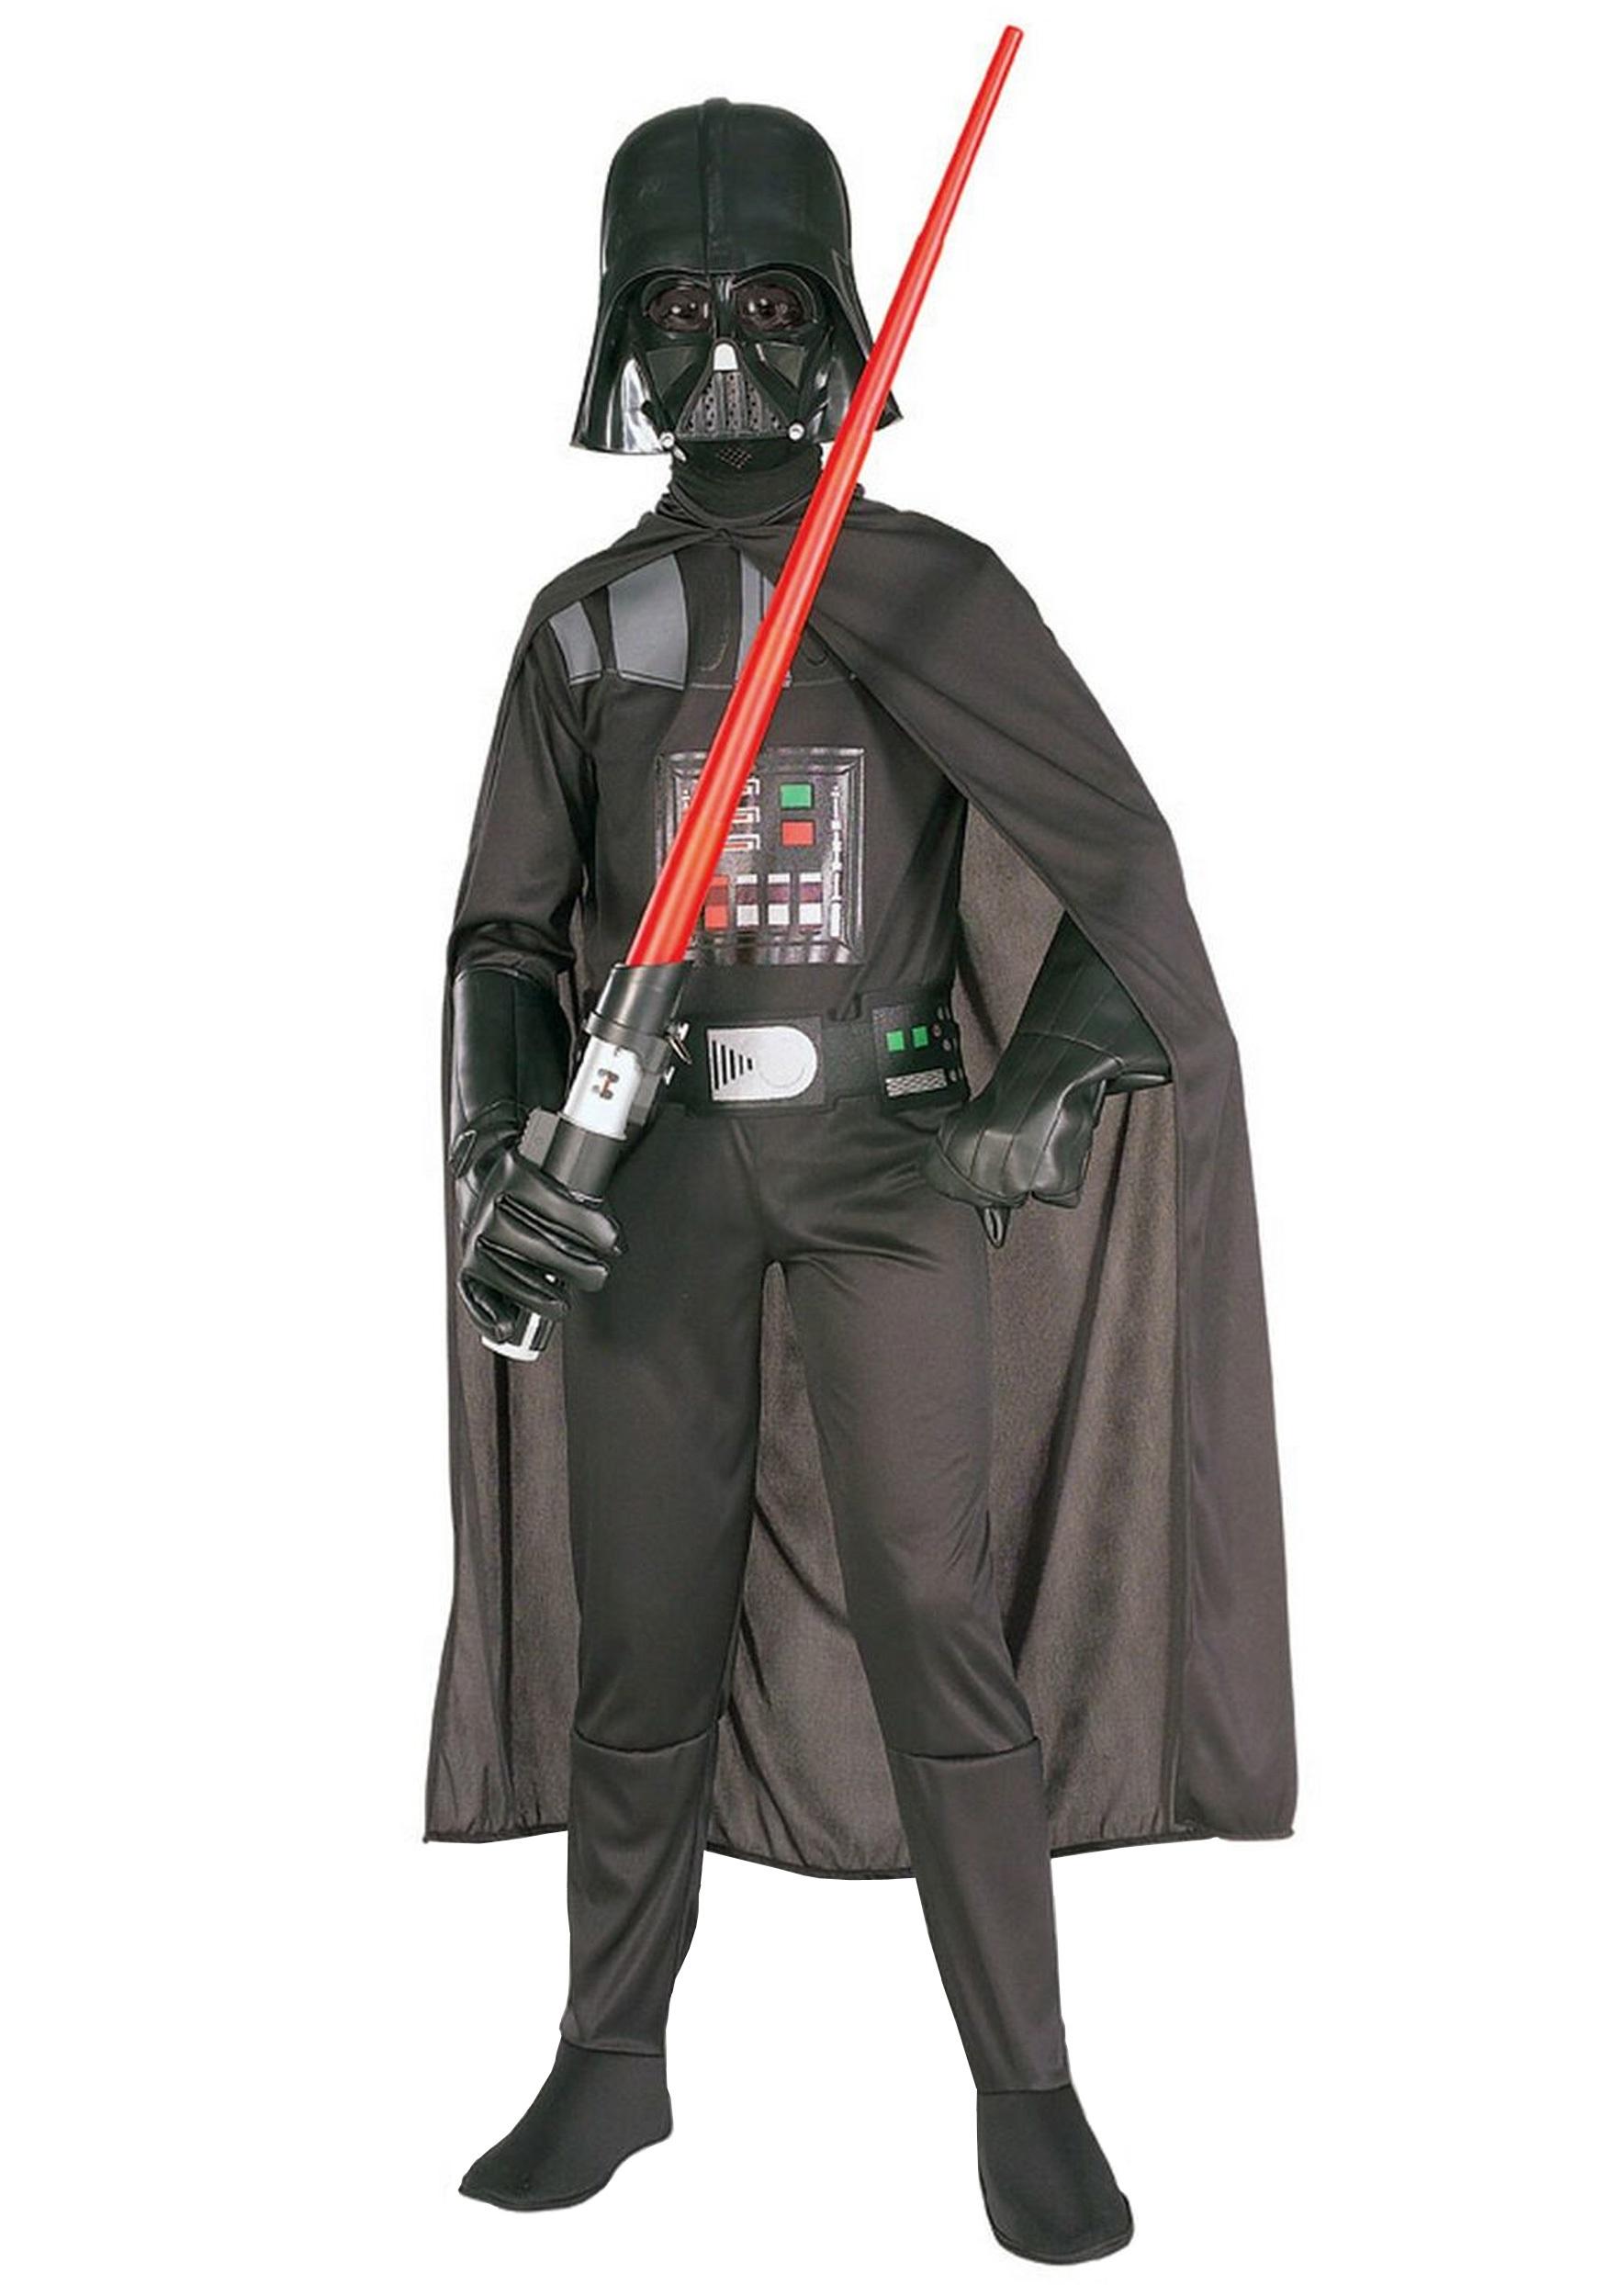 sc 1 st  Fun.com & Kids Darth Vader Costume